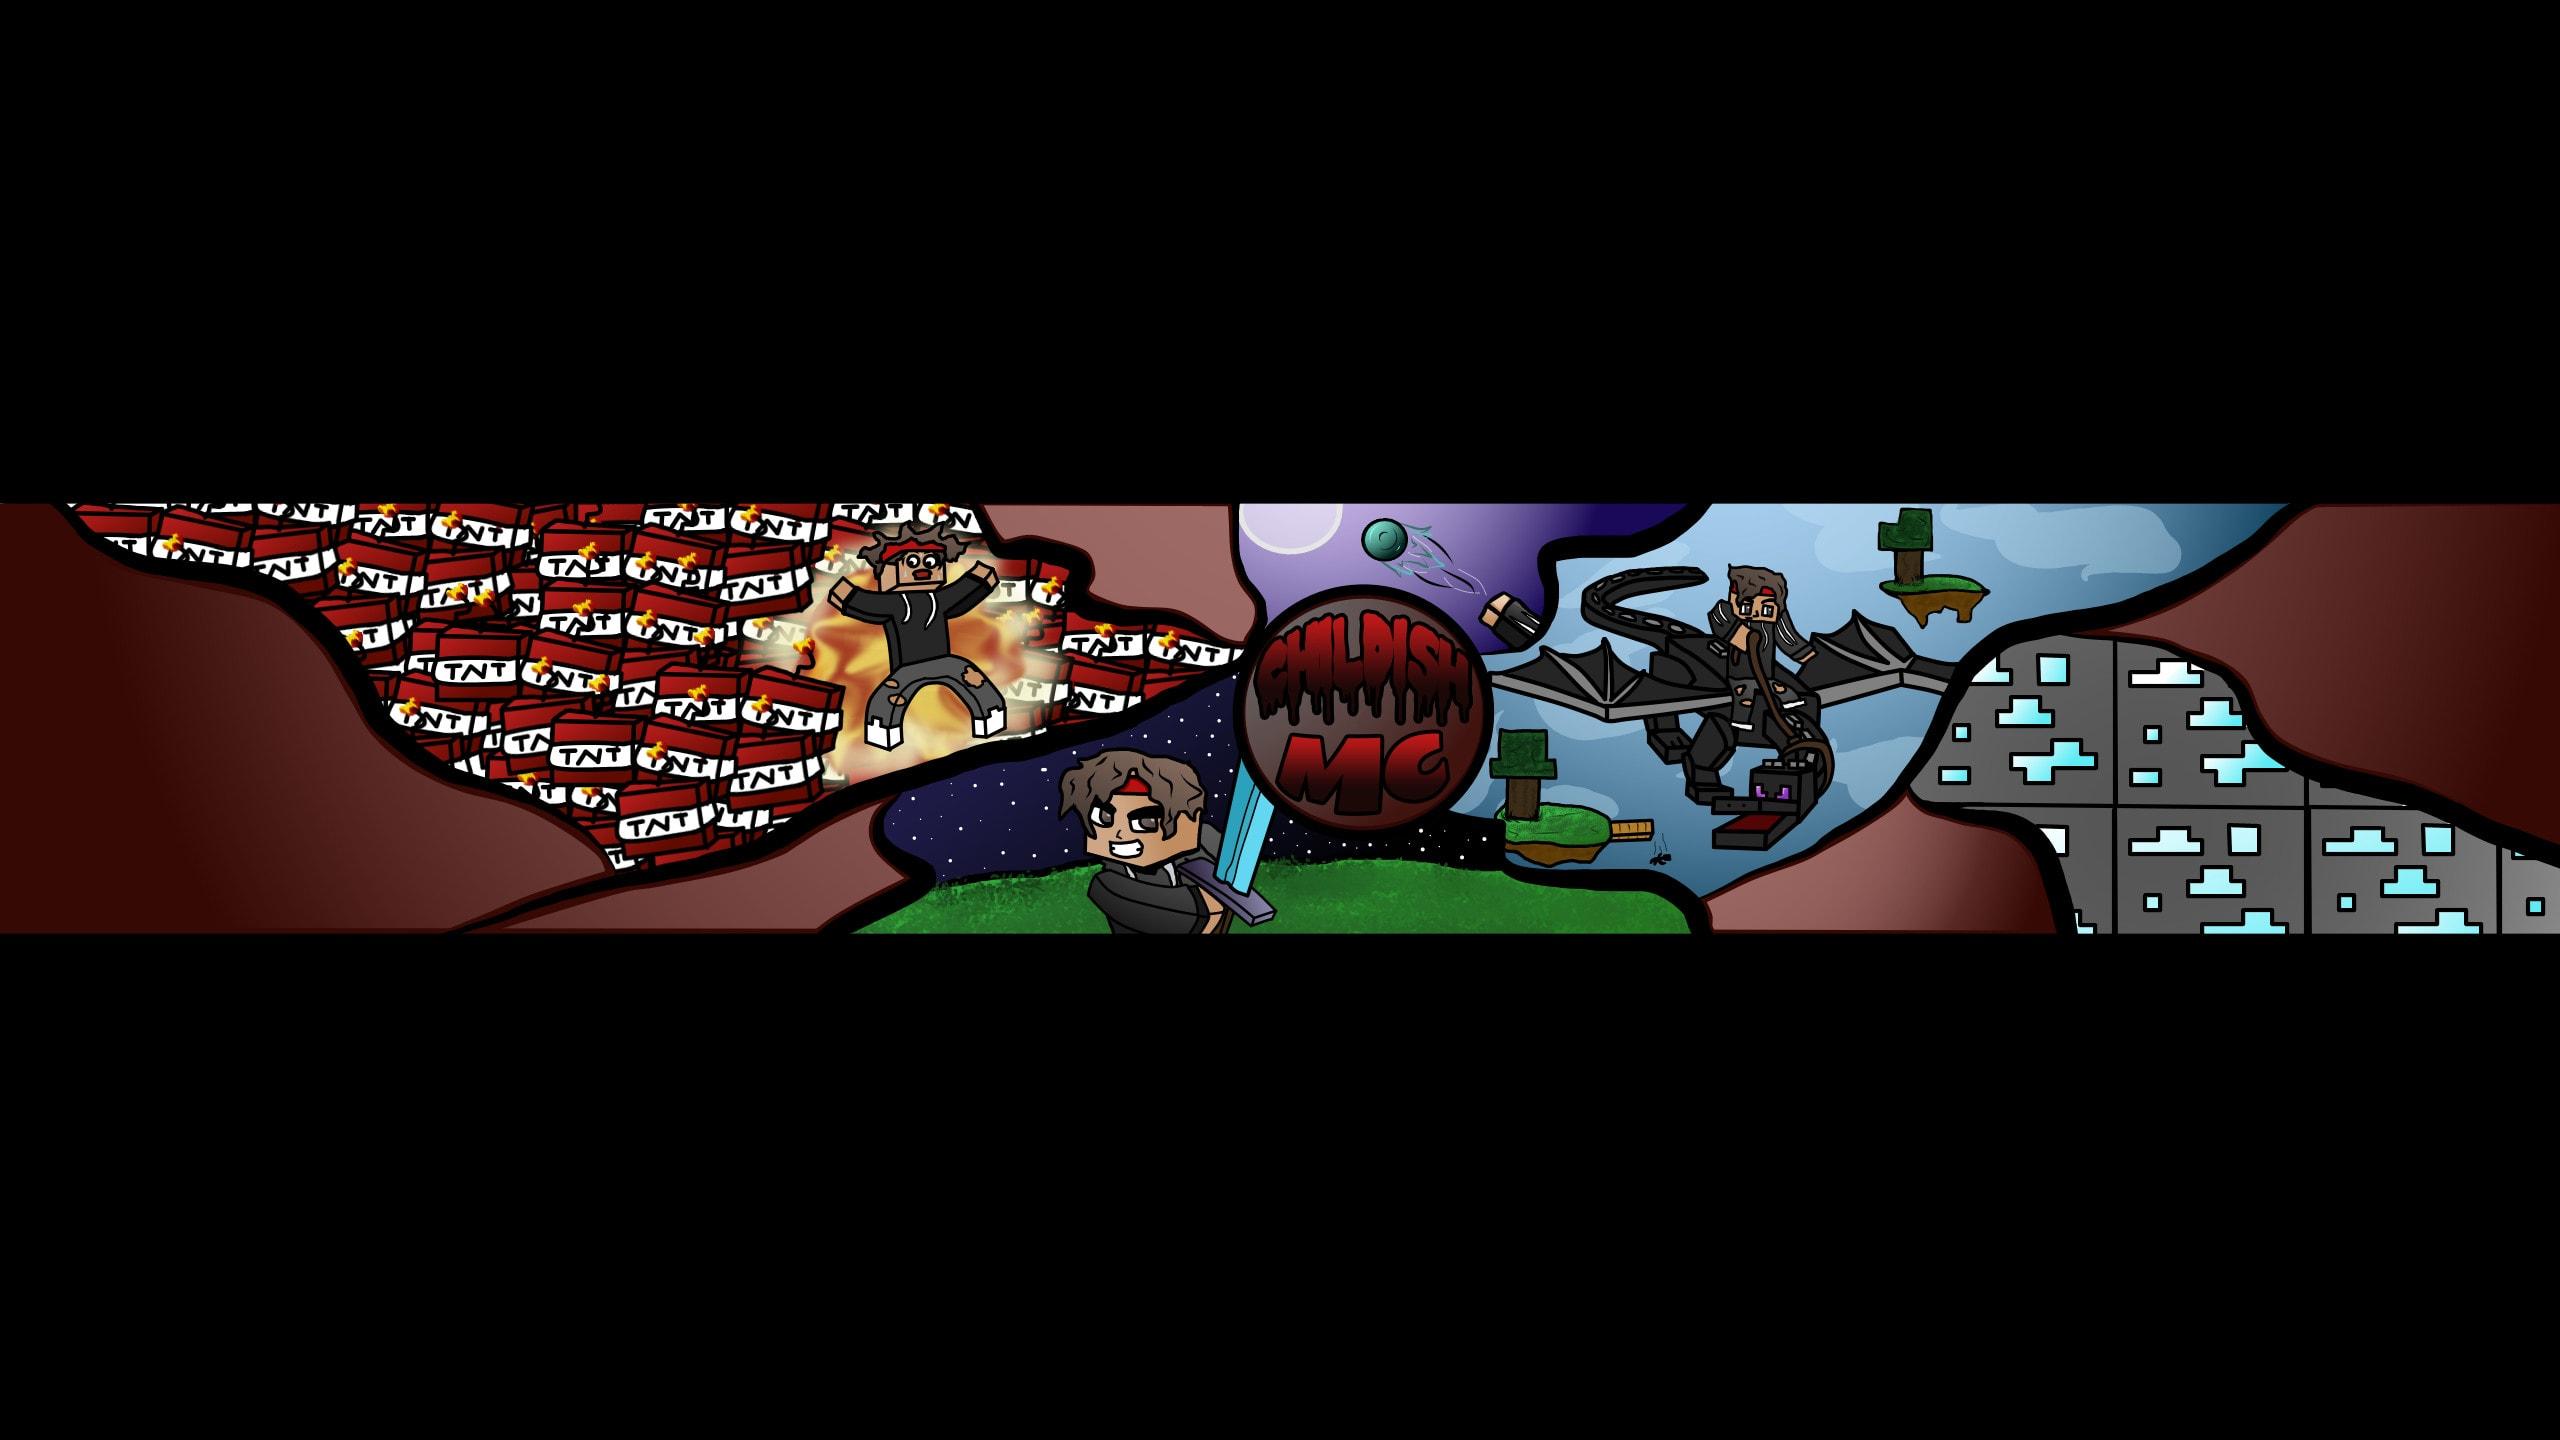 Draw A Professional Fortnite Youtube Banner By Mrwoofdog